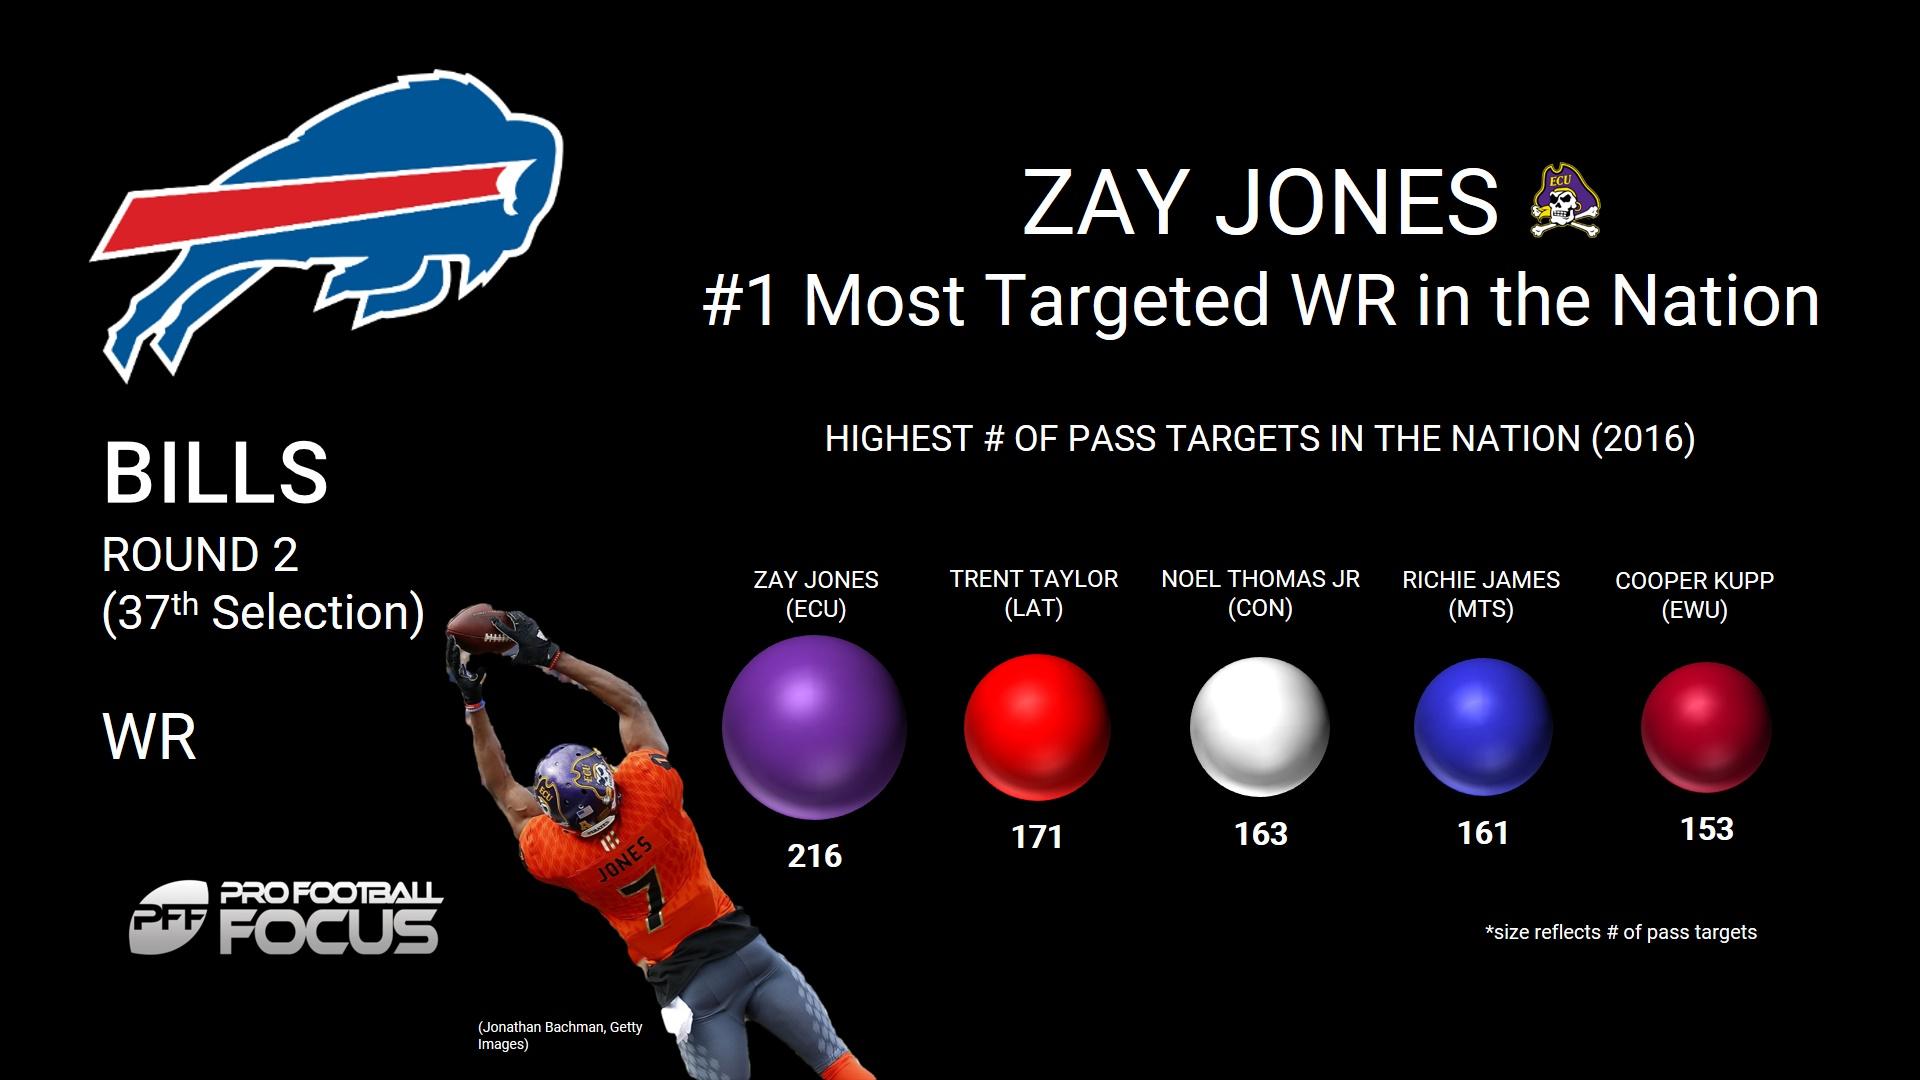 Zay Jones